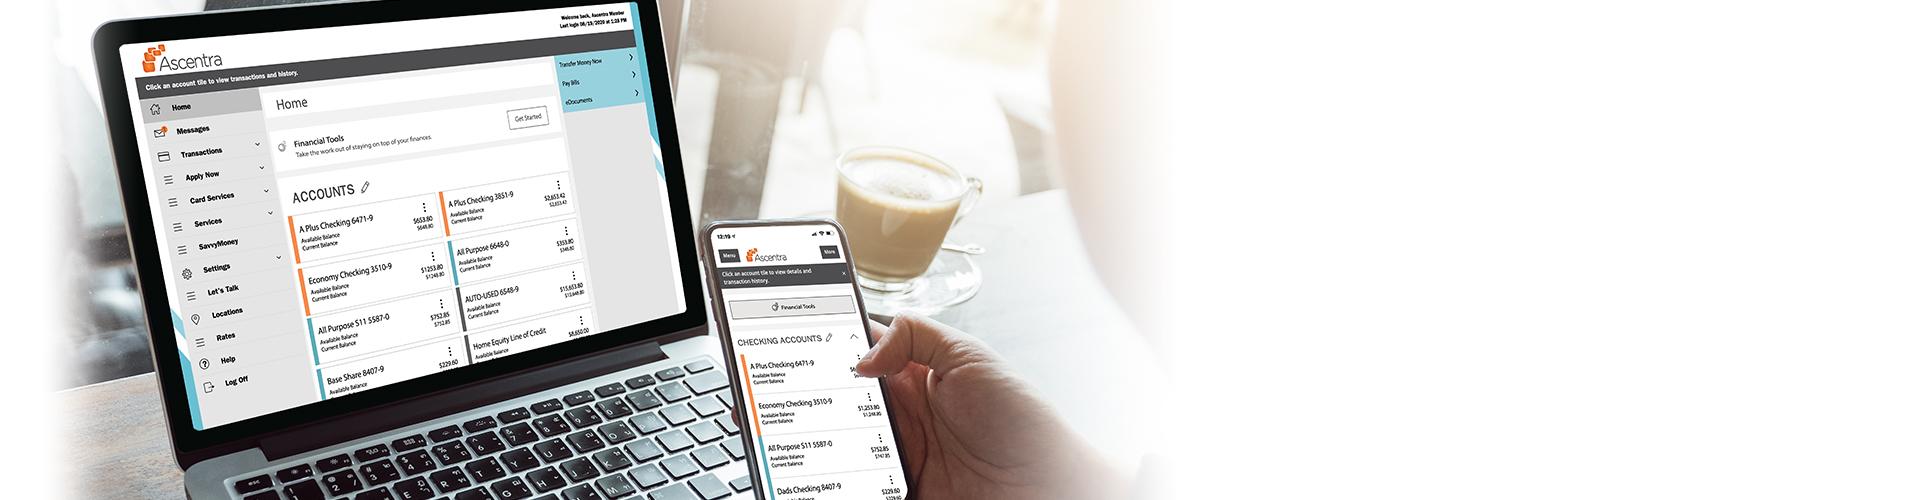 screenshot of digital banking dashboard on laptop and phone